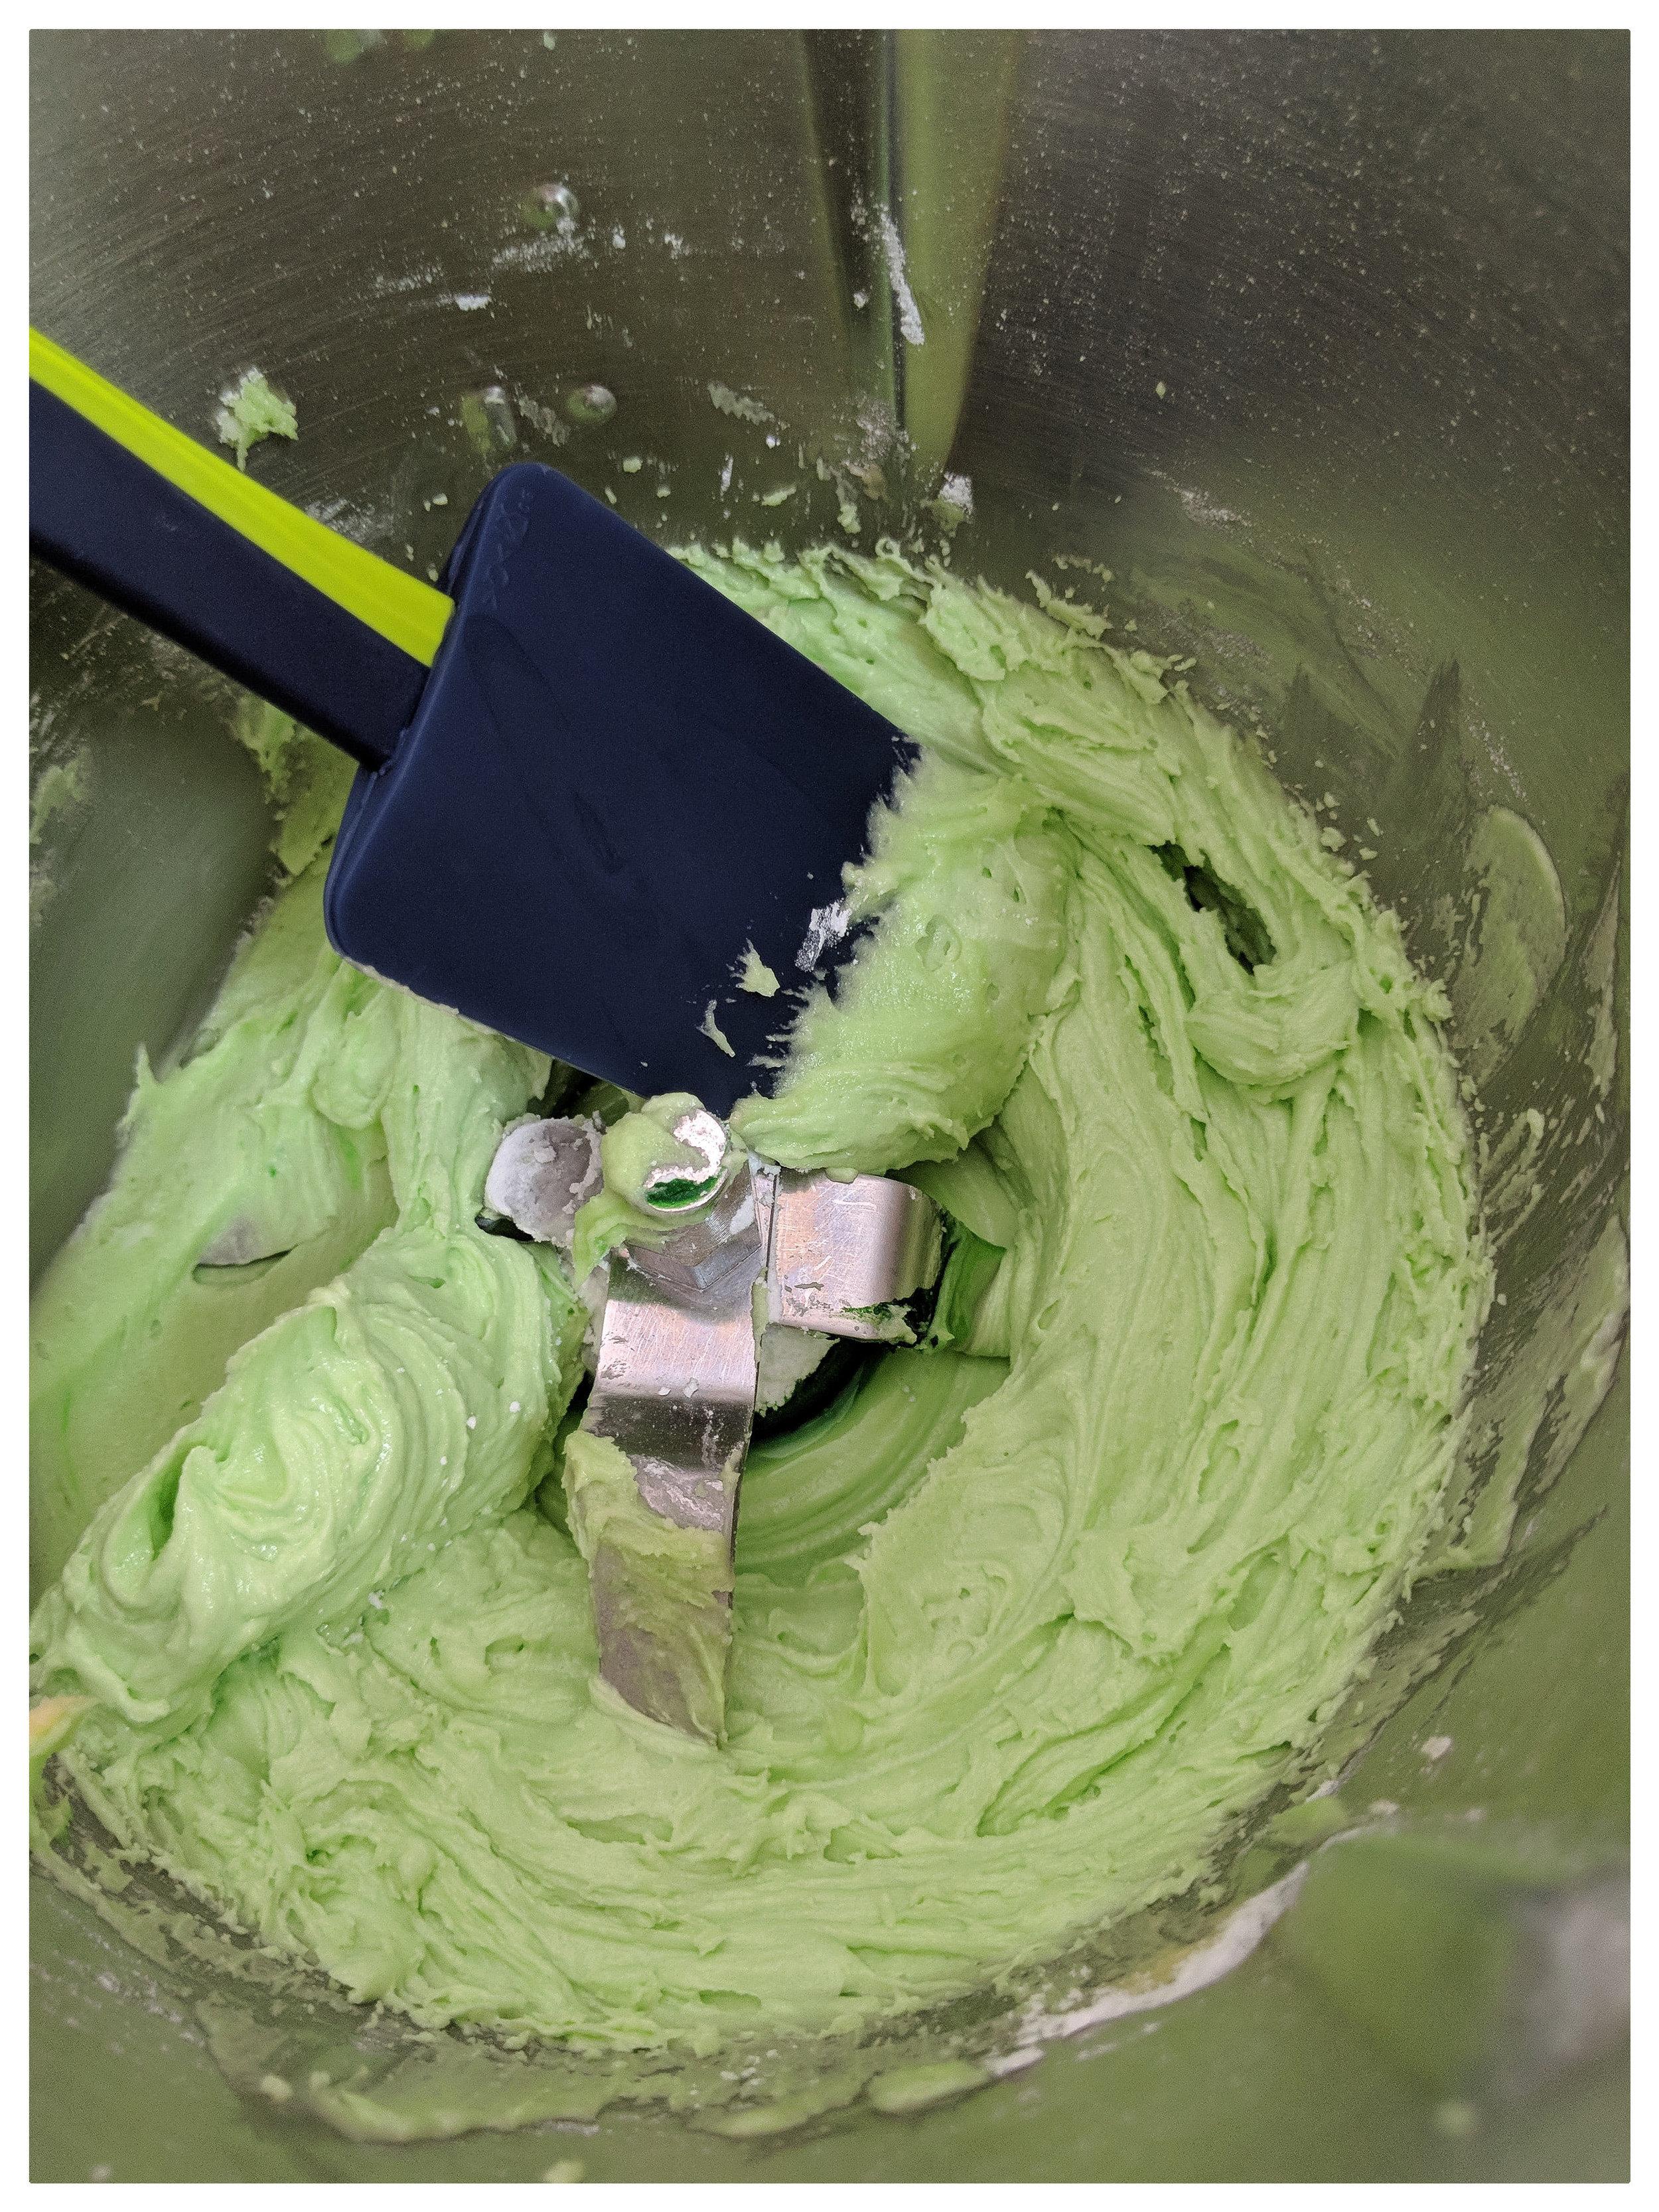 Icing mixture